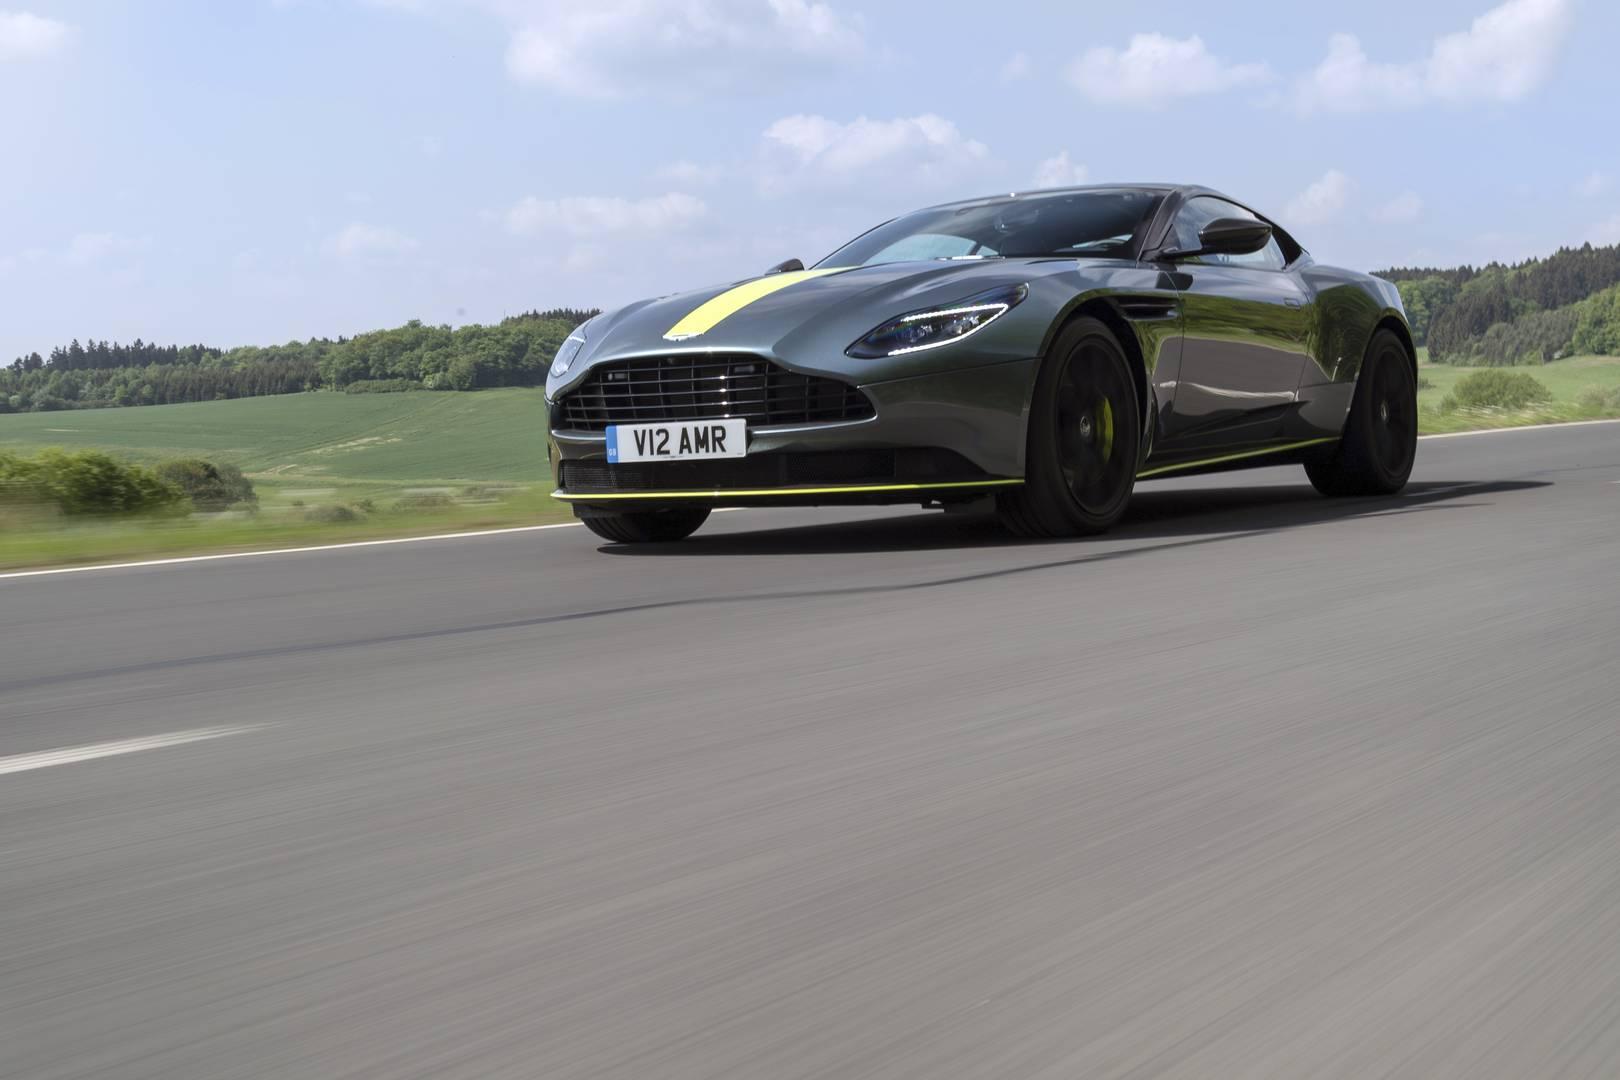 2019 Aston Martin Db11 Amr Review Gtspirit